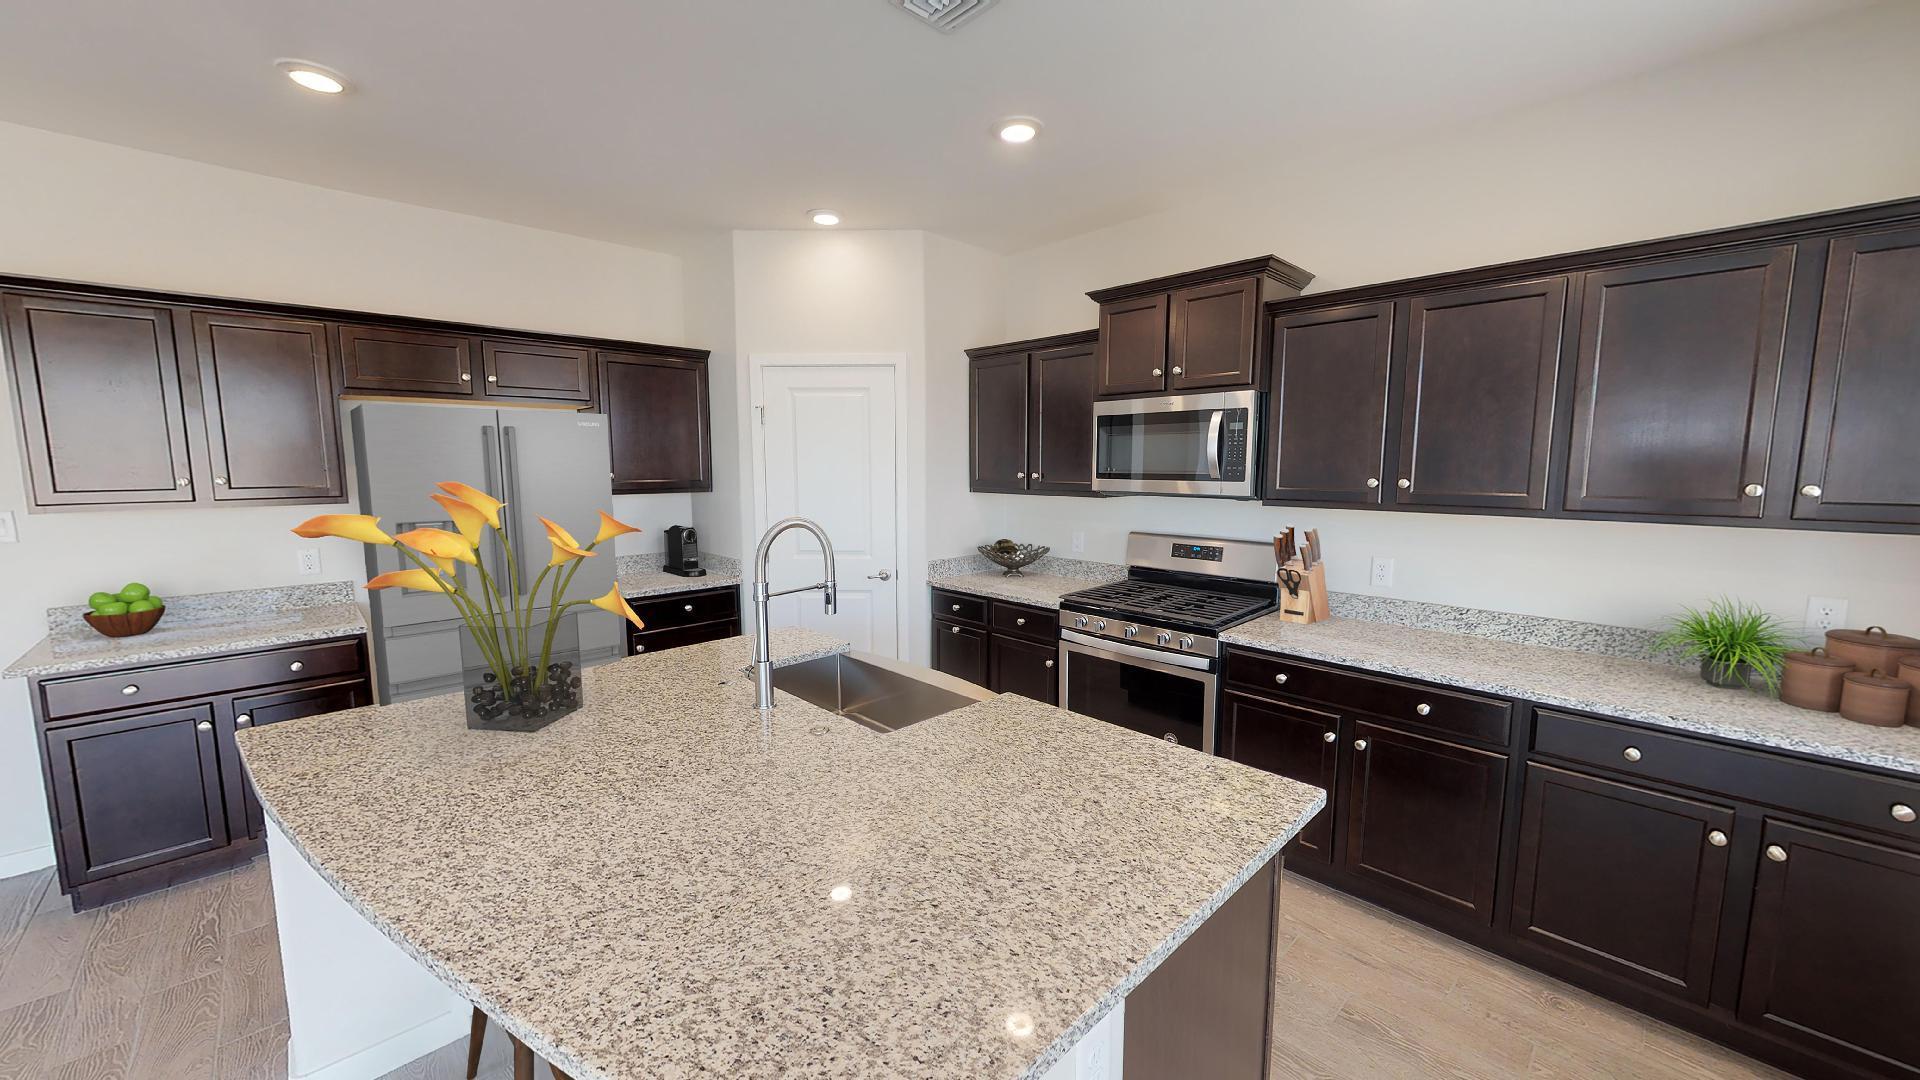 Kitchen featured in the Plan 1577 By Elliott Homes - Arizona in Yuma, AZ